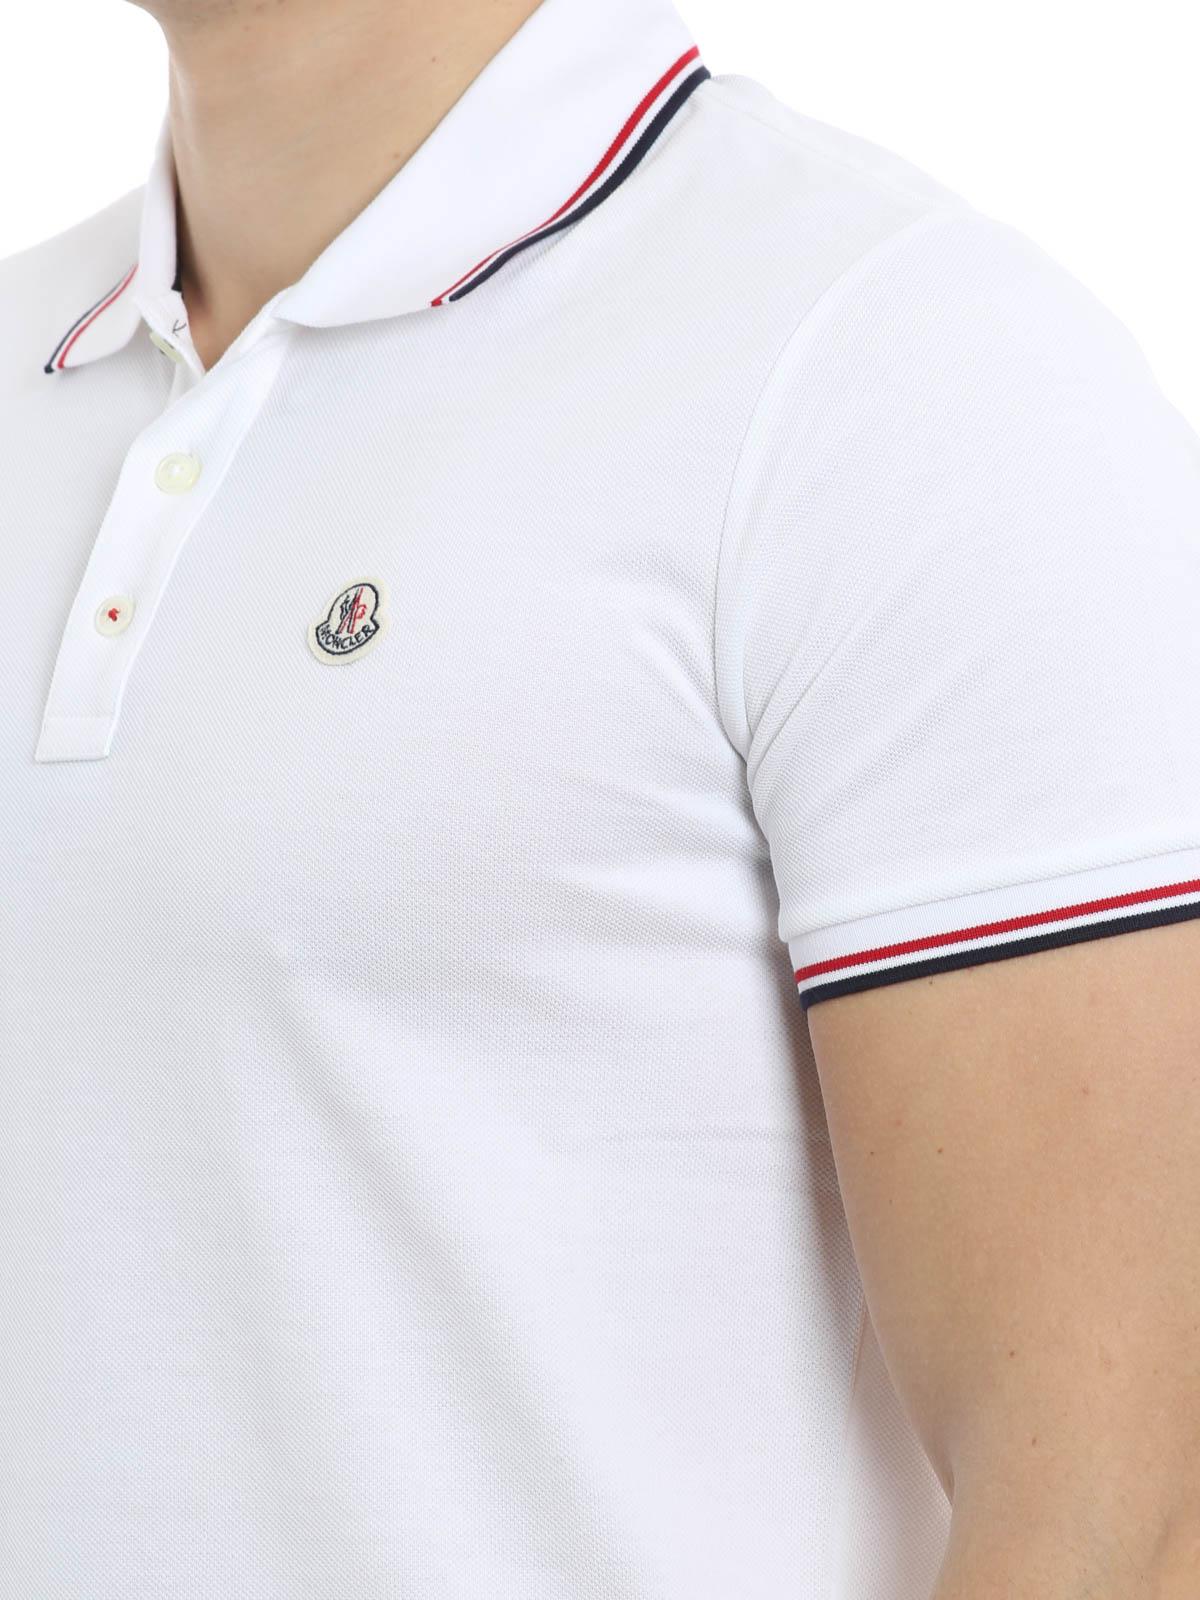 bekannte Marke Volumen groß absolut stilvoll Moncler - Poloshirt Fur Herren - Weiß - Poloshirts - C1 091 ...